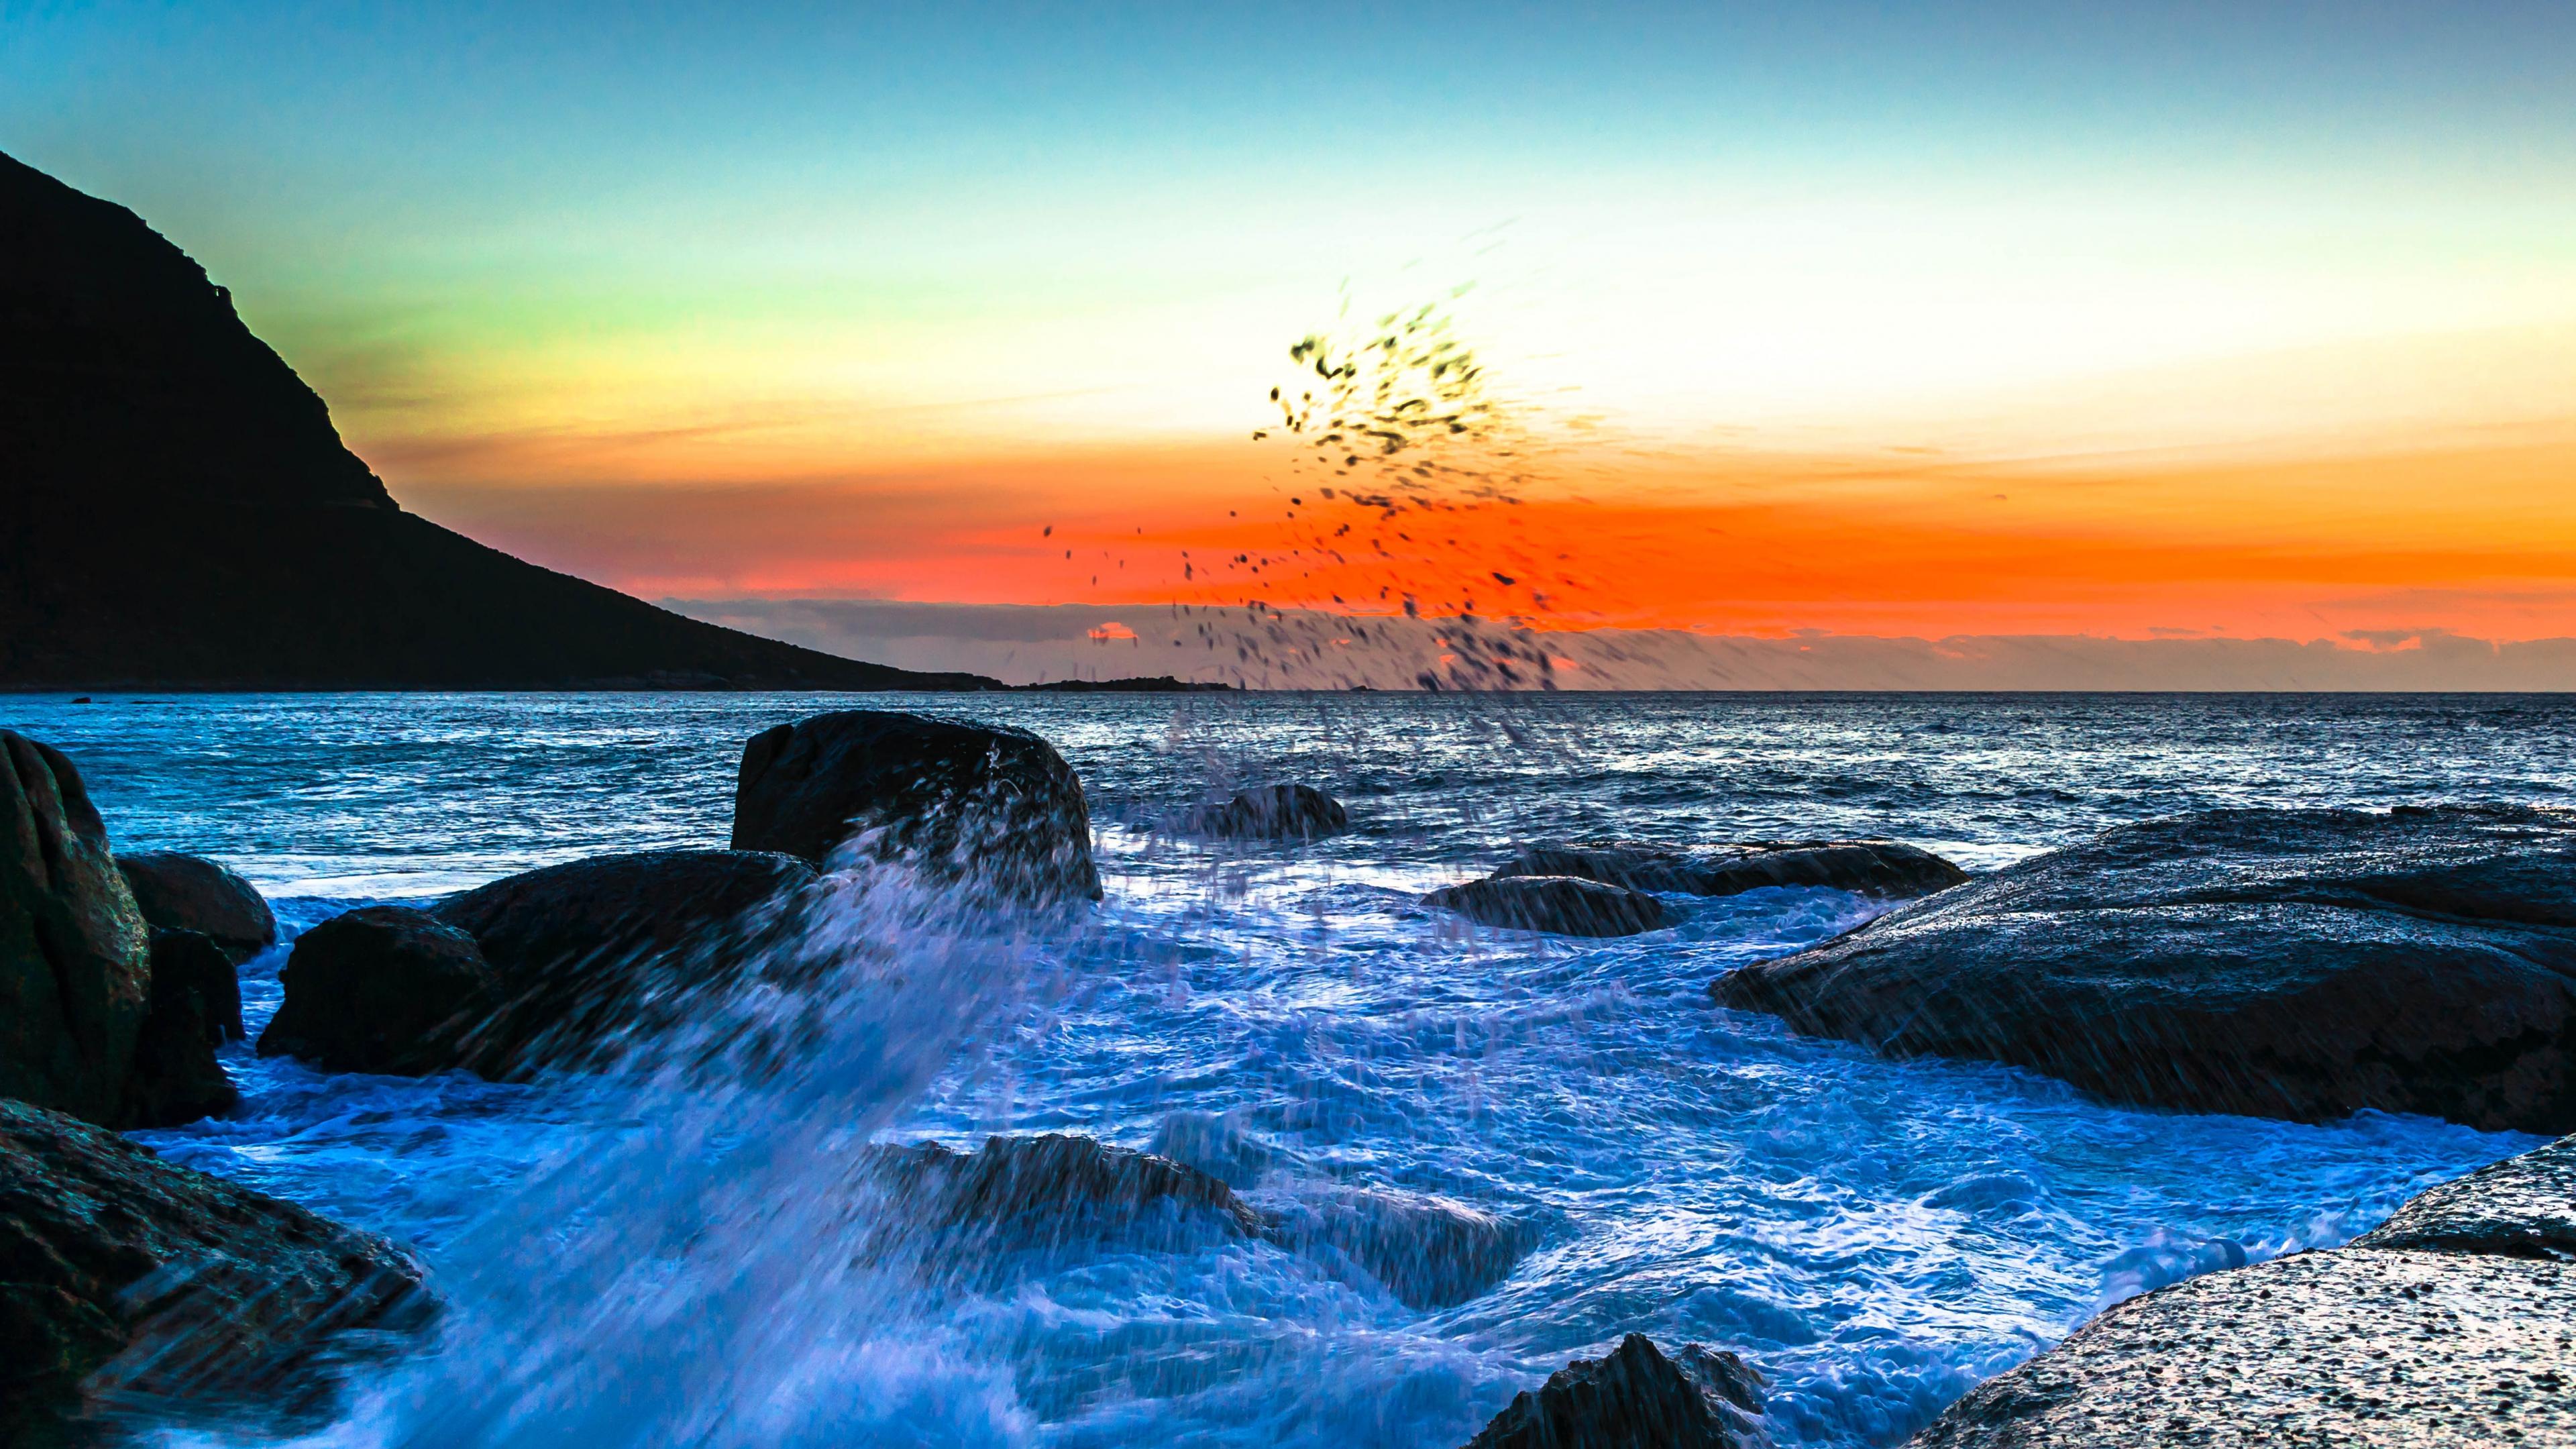 Wallpaper 3840x2160 sea spray surf sunset 4K Ultra HD HD Background 3840x2160